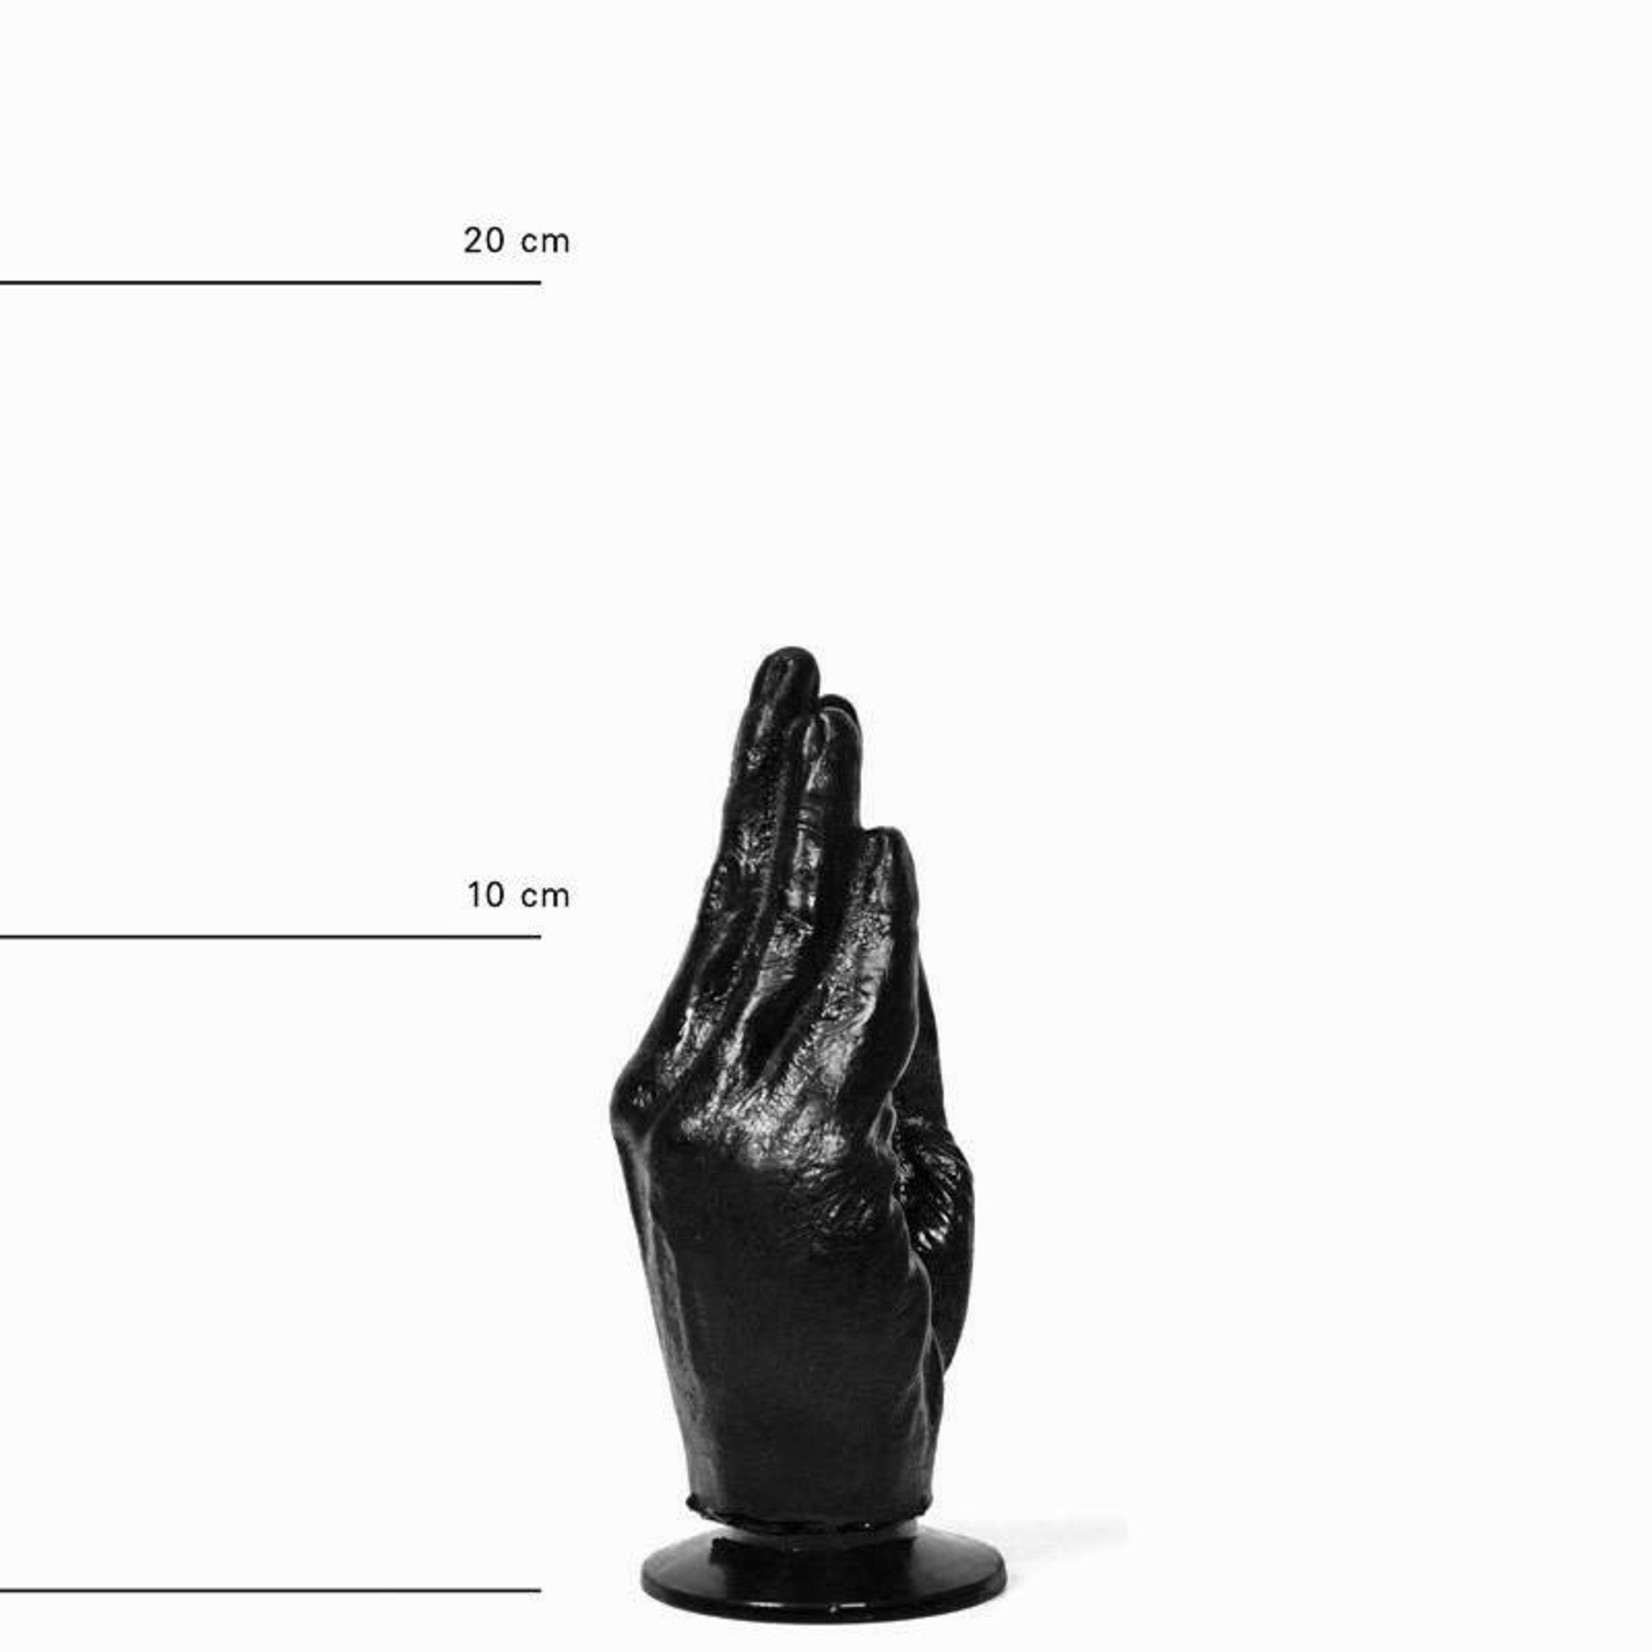 All Black All Black Dildo - AB 13